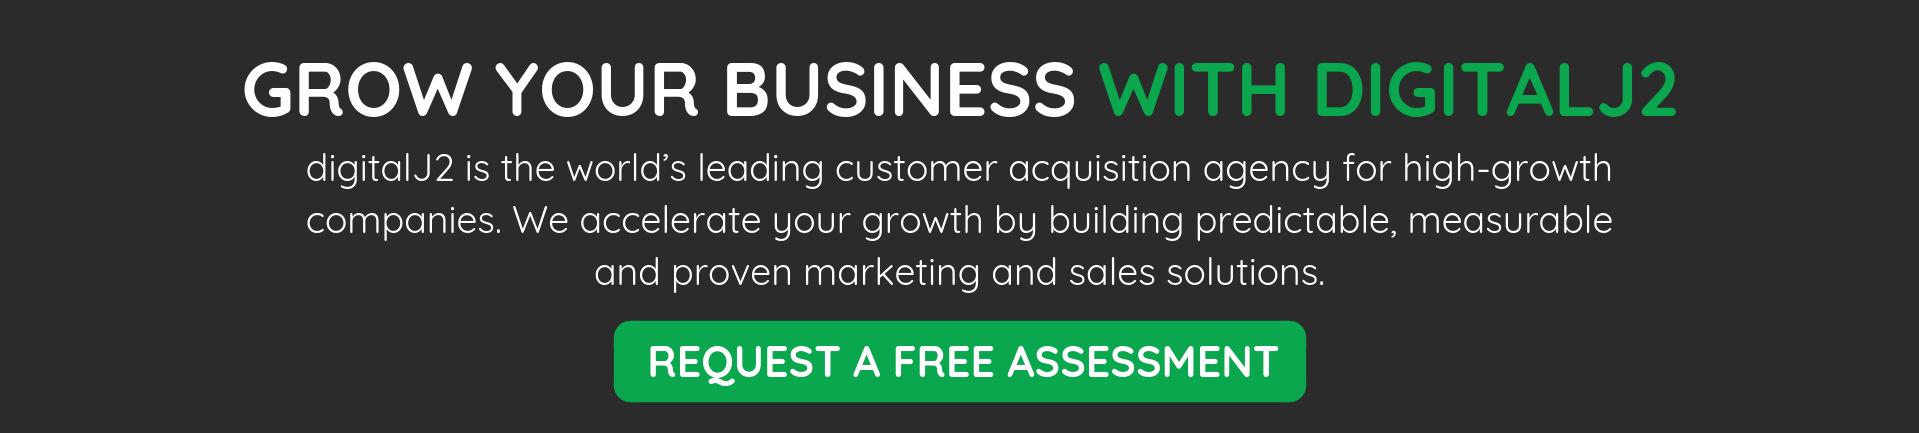 Grow-Your-Business-with-digitalJ2